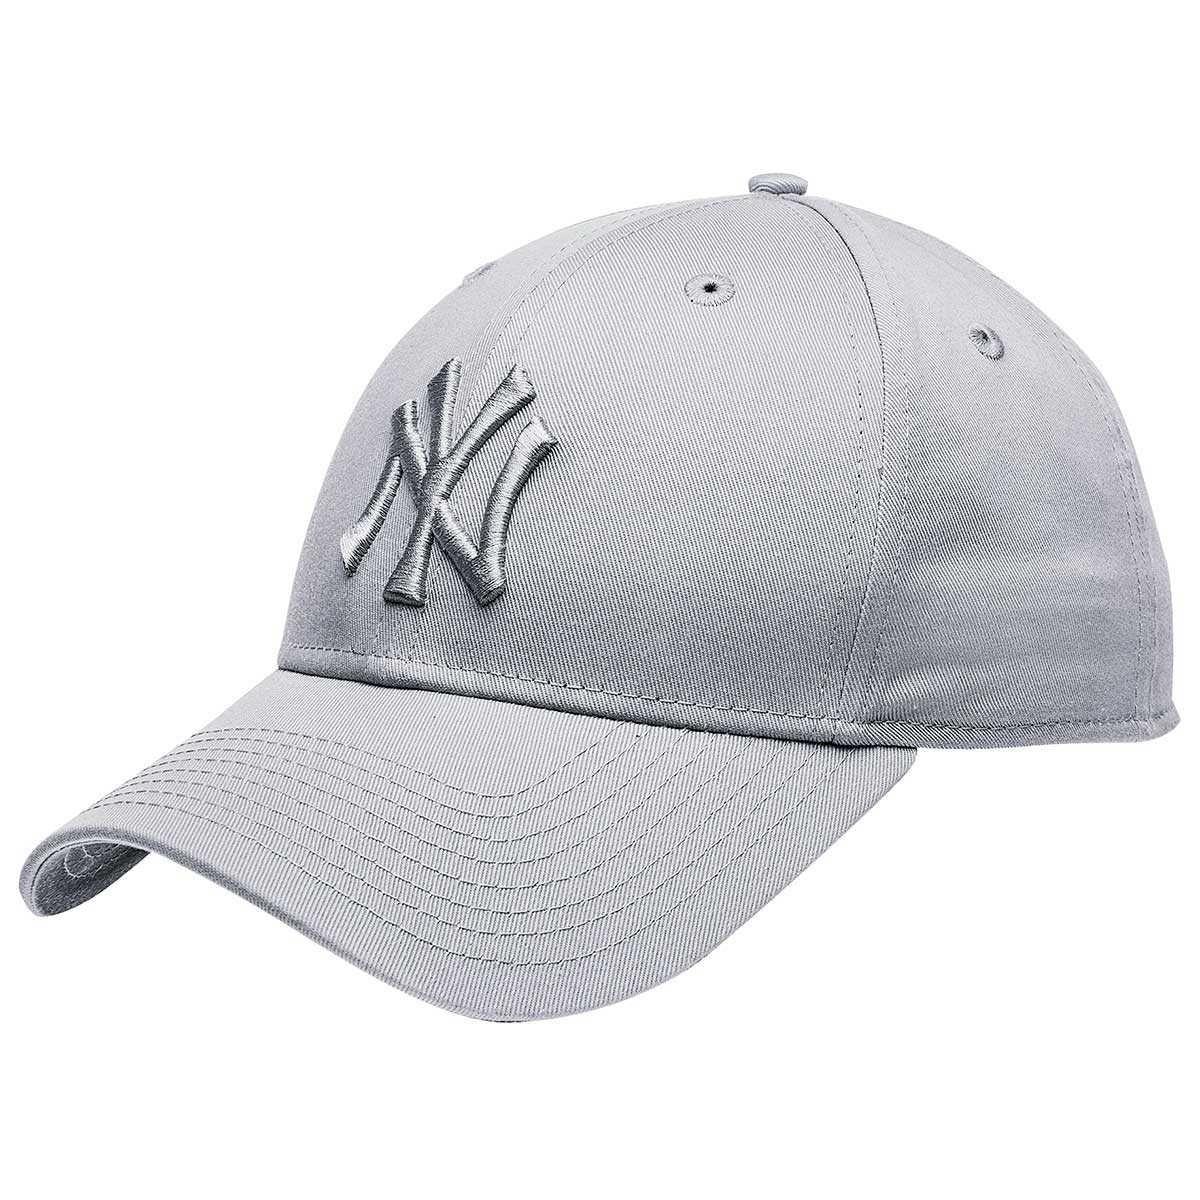 7b51a41d879c Gorra Para Caballero New Era Yankees Original 11475892 Dgt